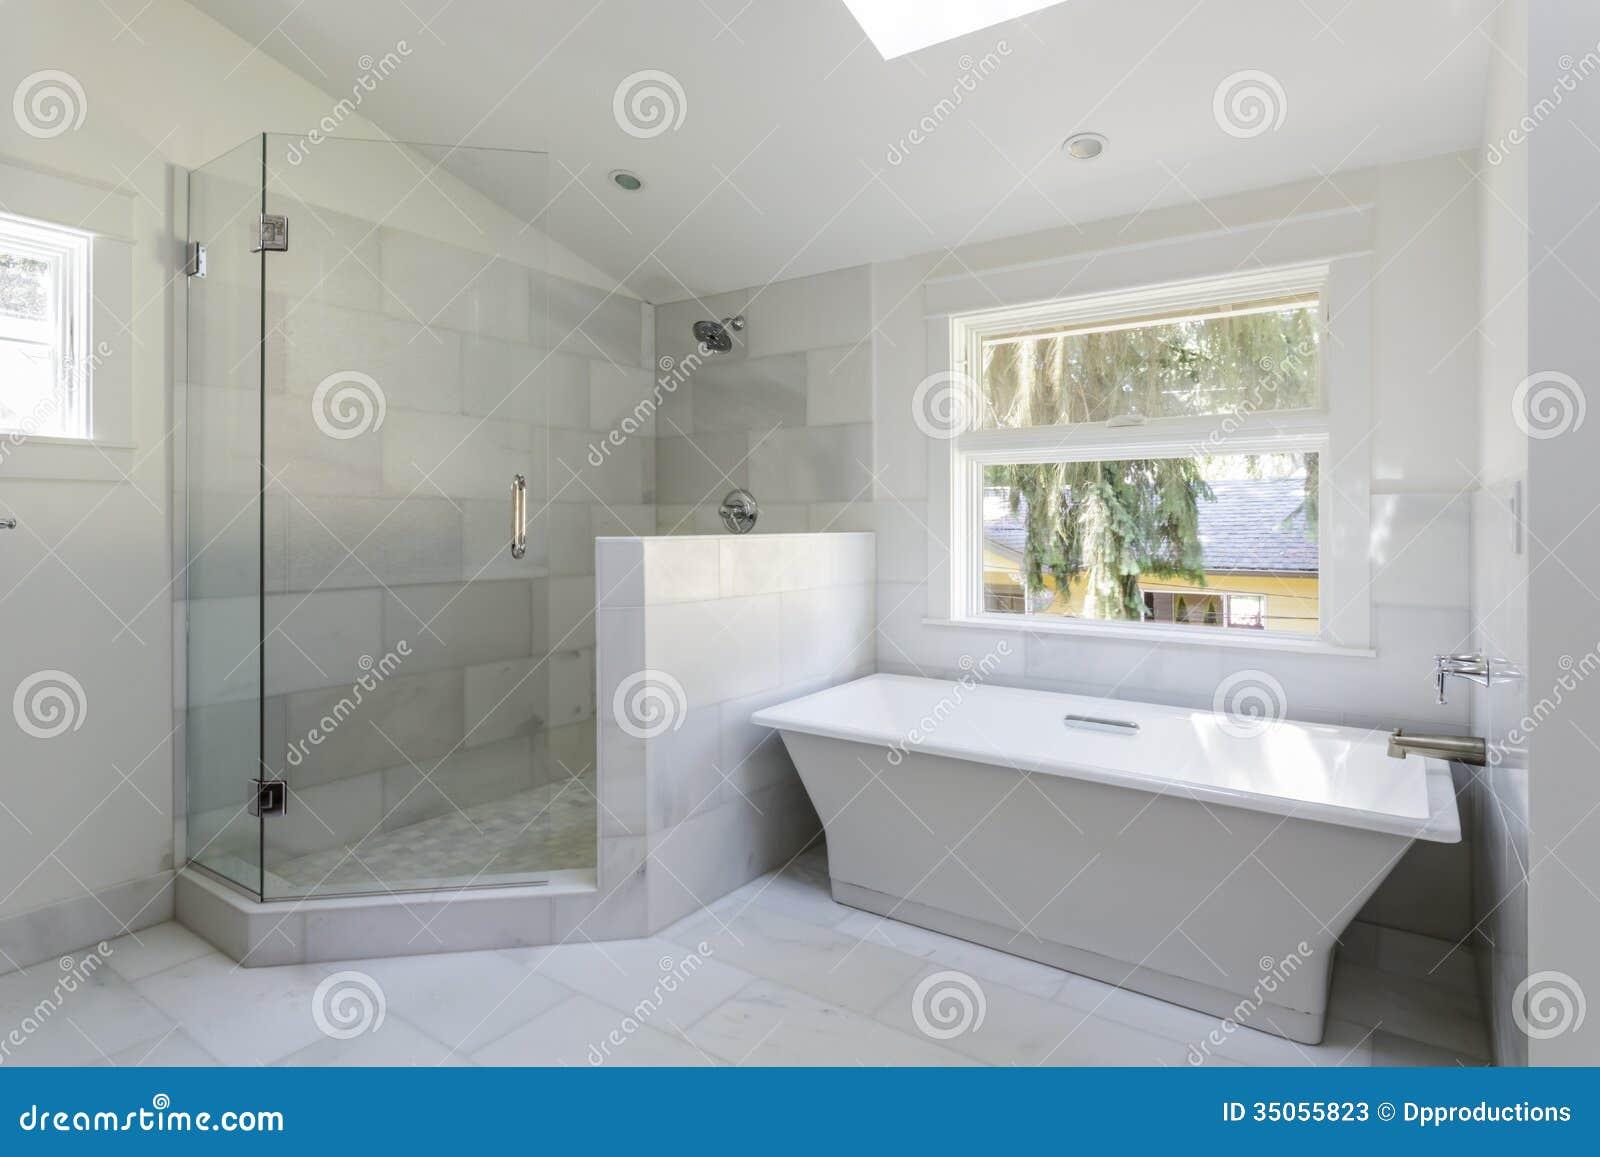 Modernt badrum med duschen och badkaret arkivfoton   bild: 35055823